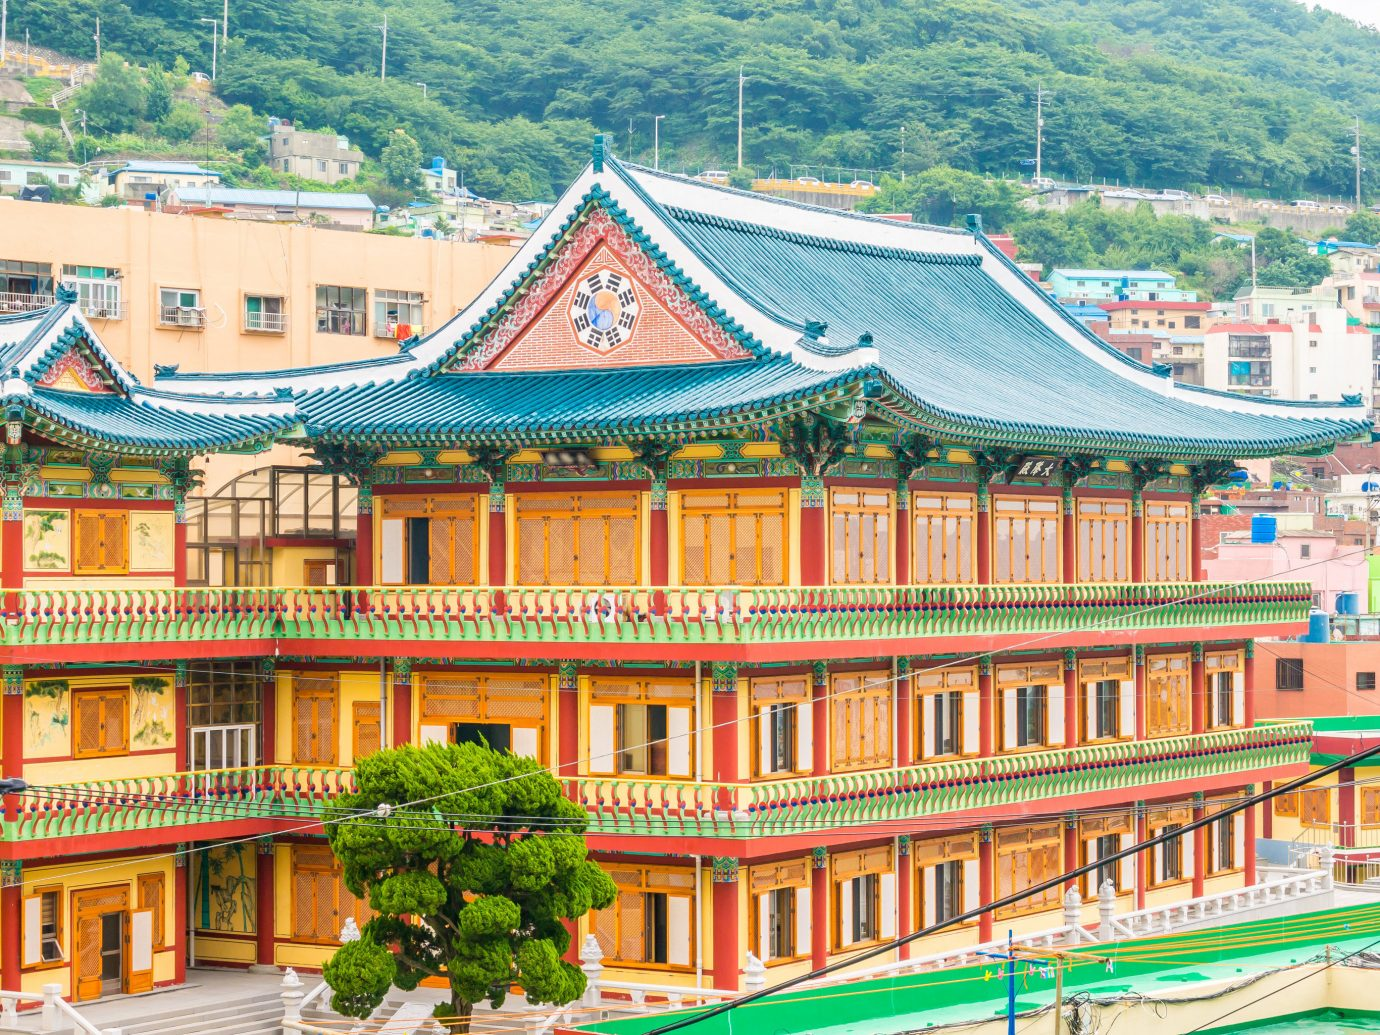 Trip Ideas chinese architecture landmark temple leisure shrine shinto shrine tourism City building